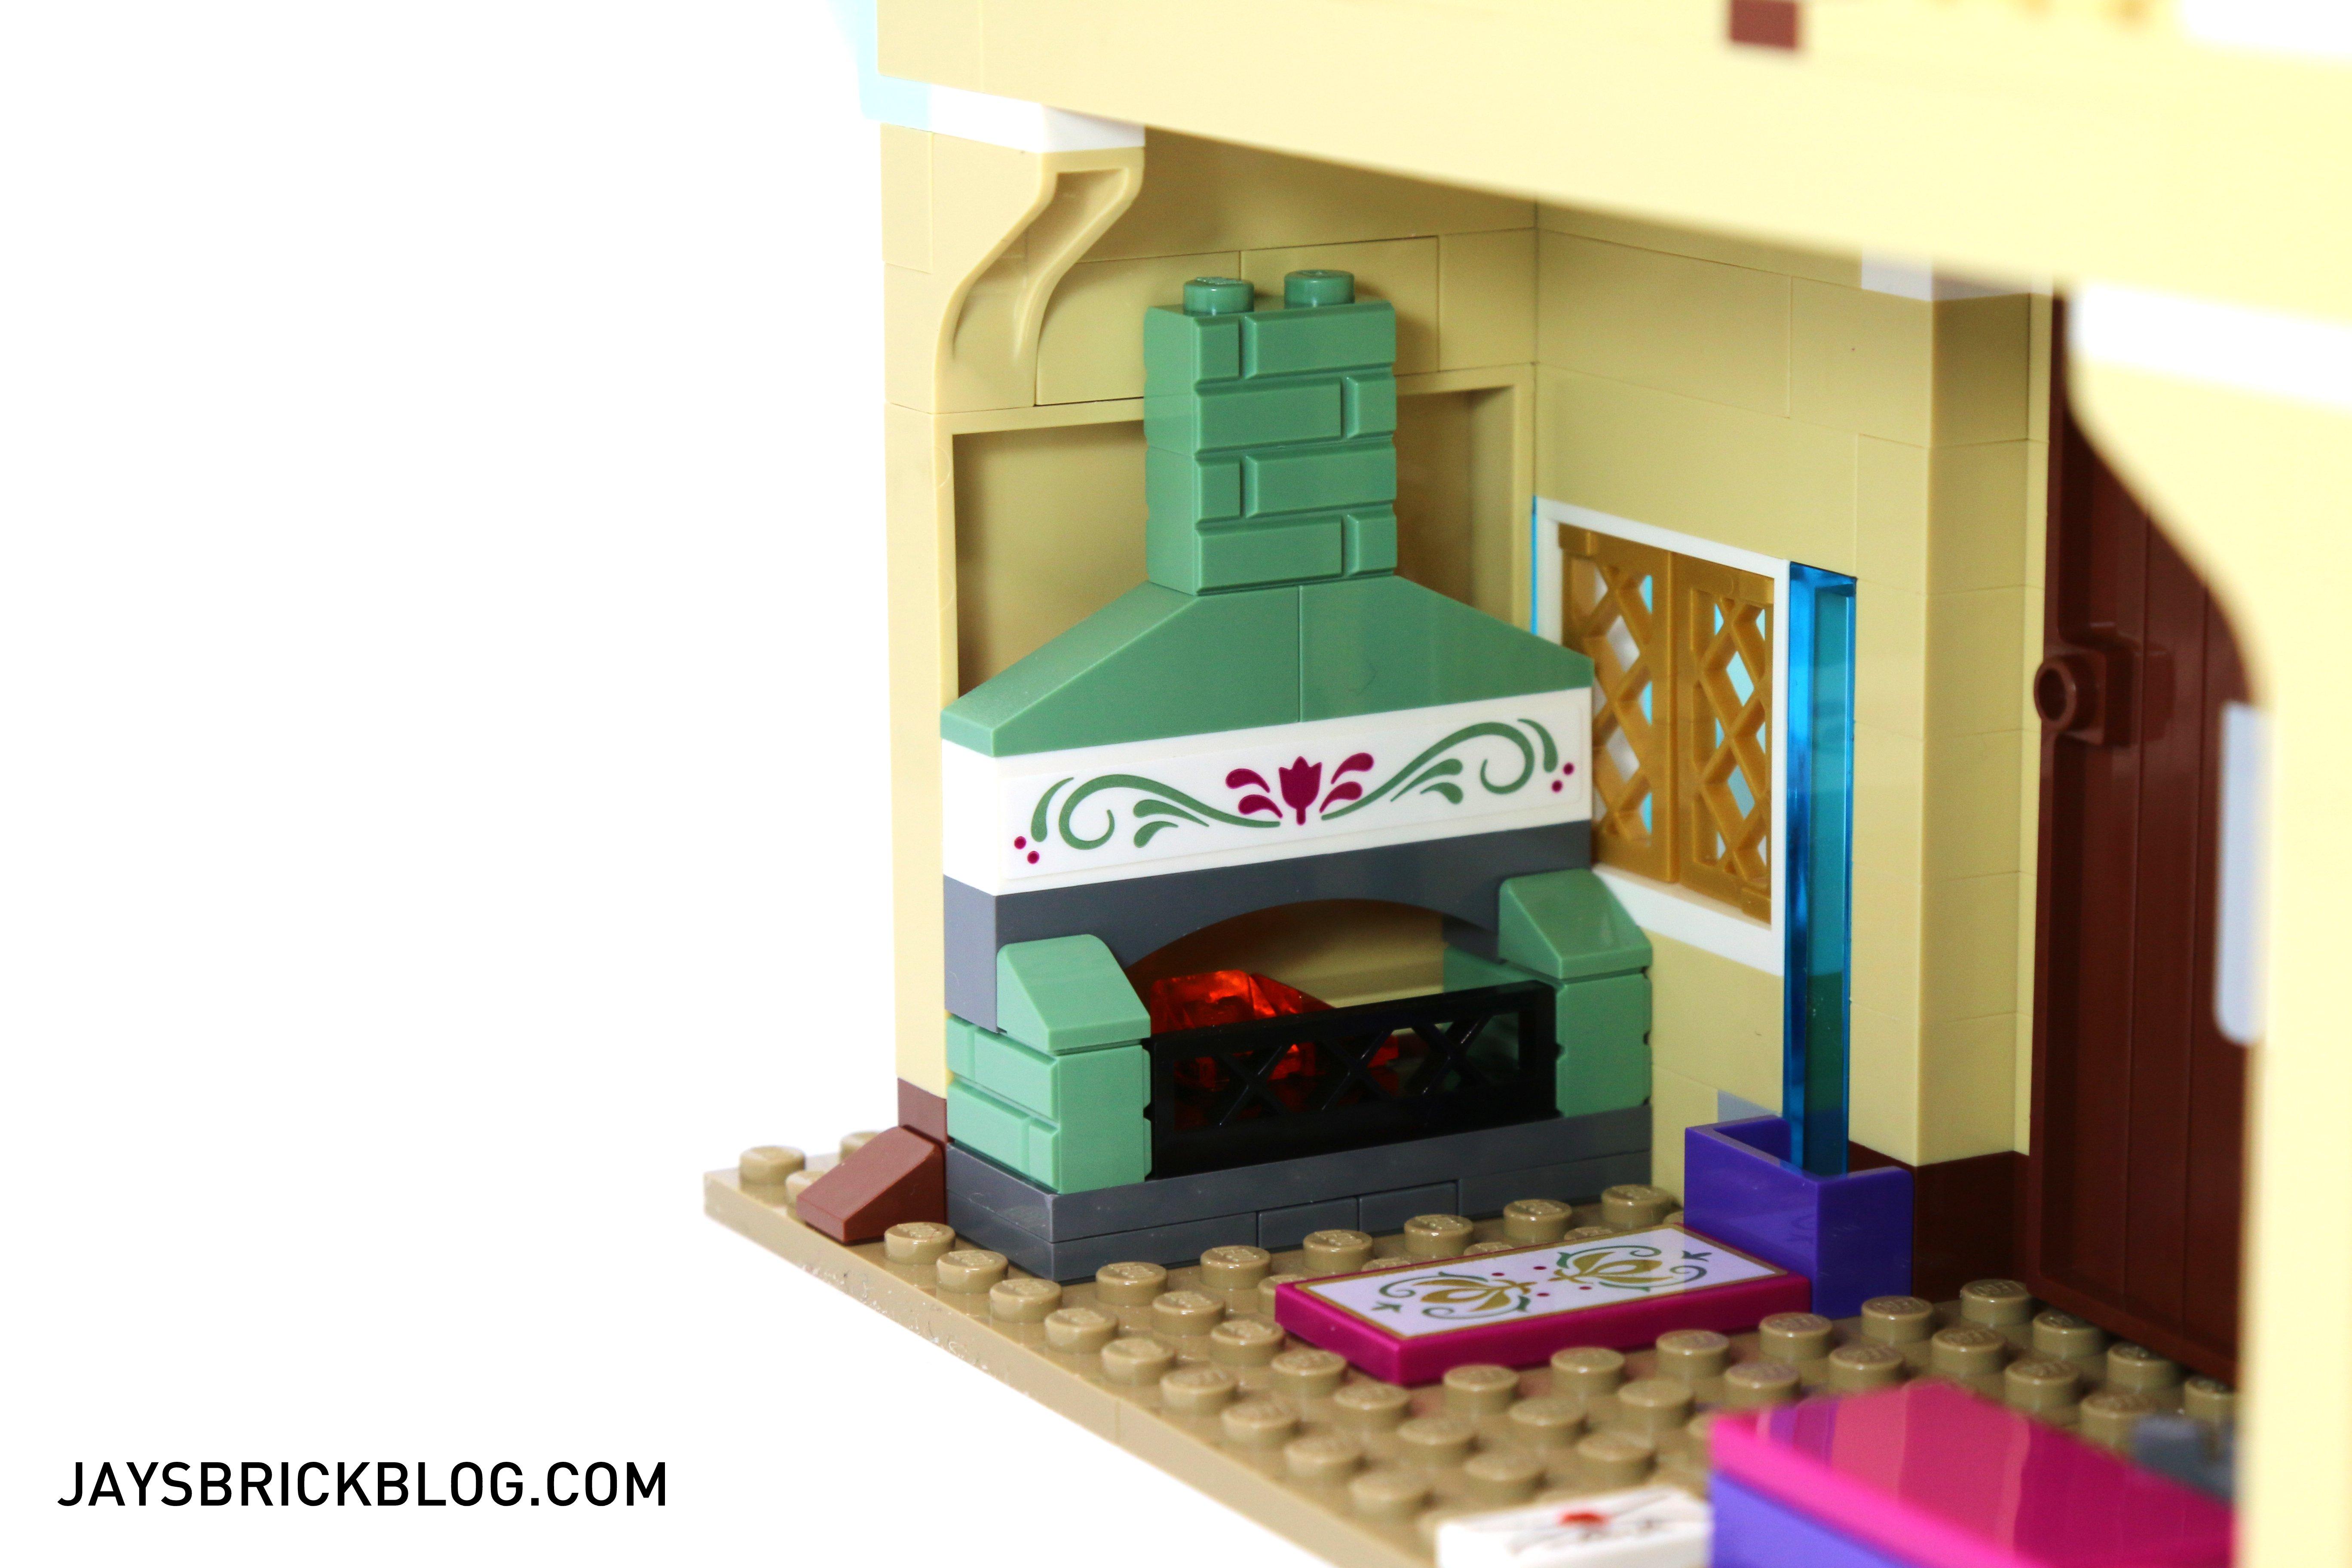 Review Lego 41068 Arendelle Castle Celebration